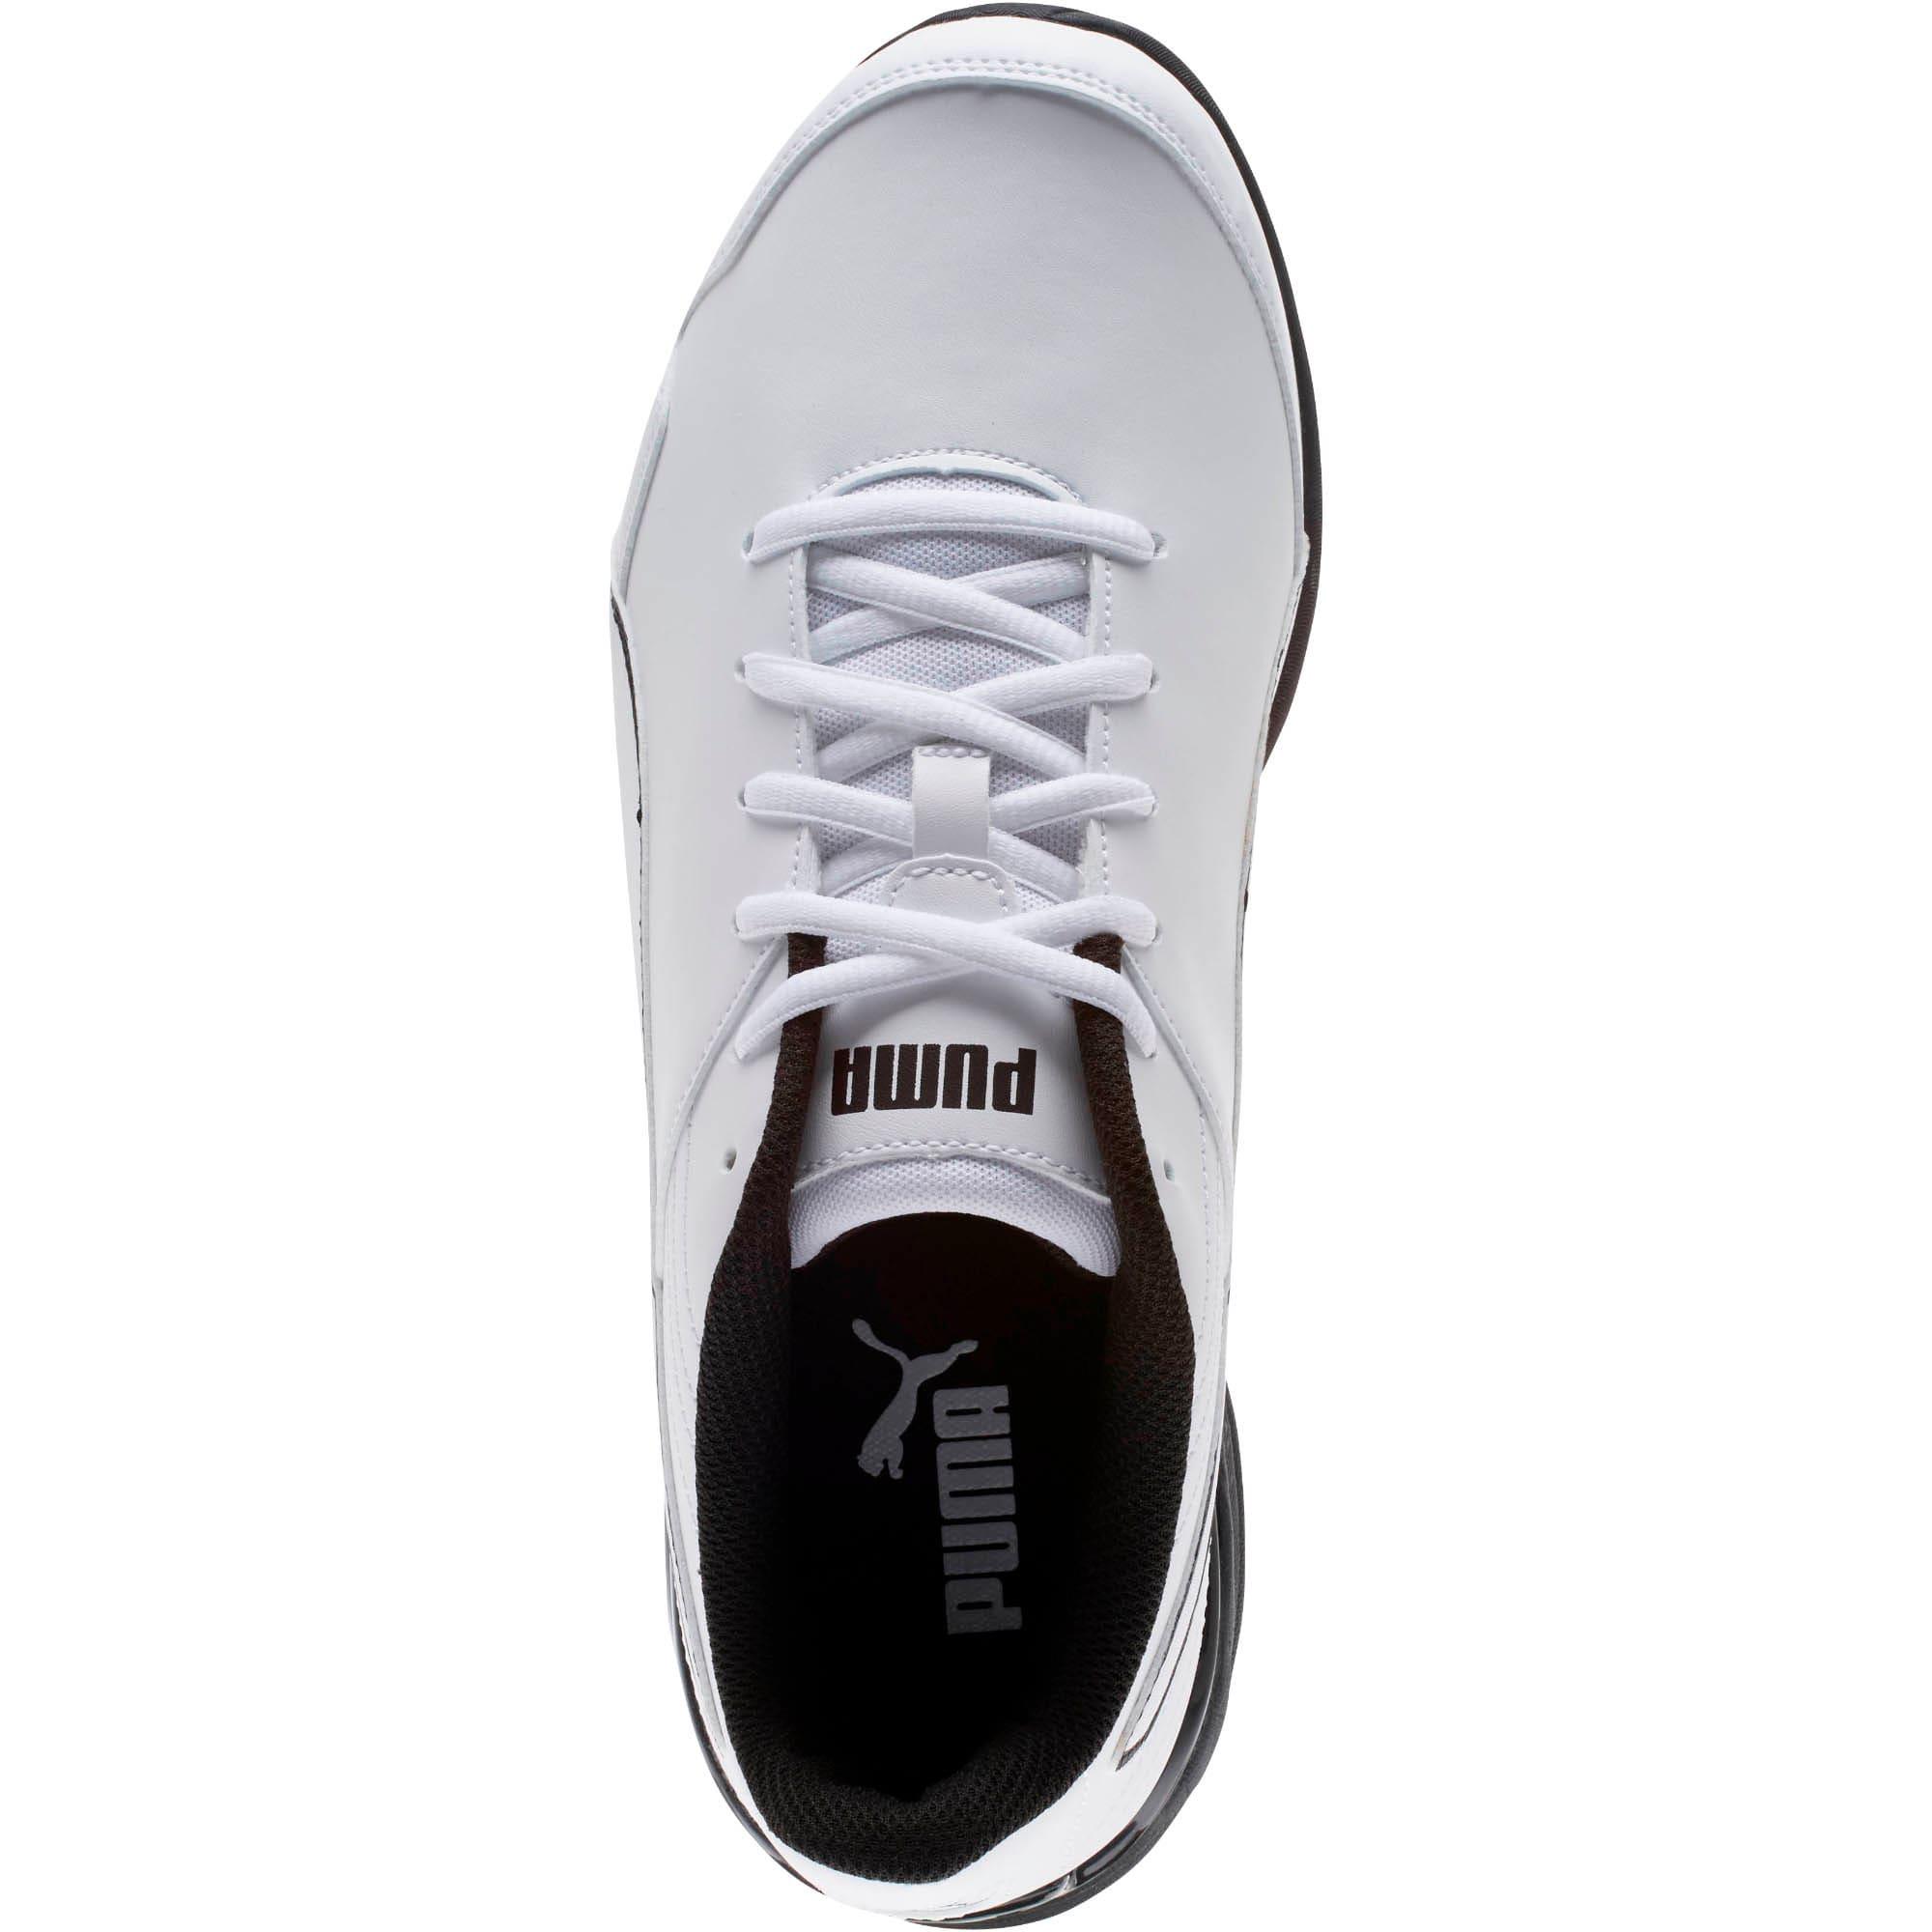 Thumbnail 5 of Super Levitate Men's Running Shoes, Puma White-Puma Black, medium